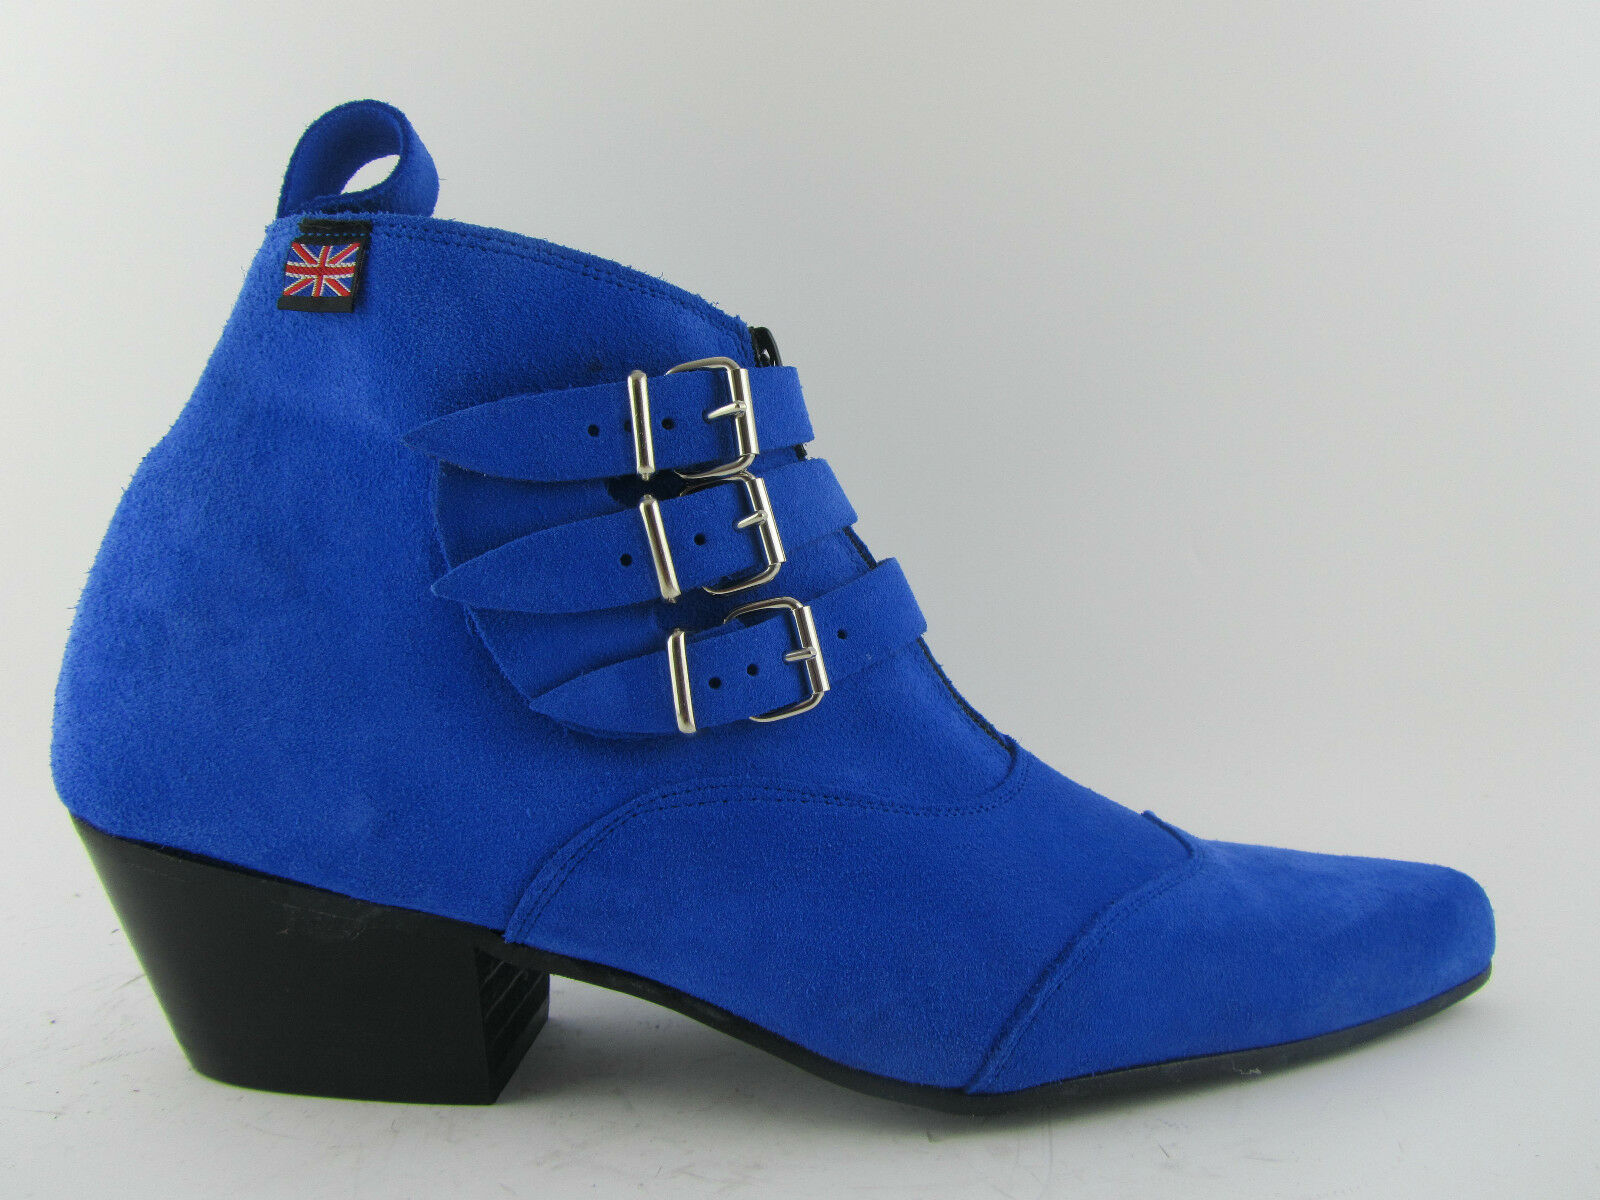 Retro  Uomo 3 Straps Stiefel Blau Suede Chelsea Beat Stiefel Straps Cuban Heel Beatle Pointed Toe 584b8b